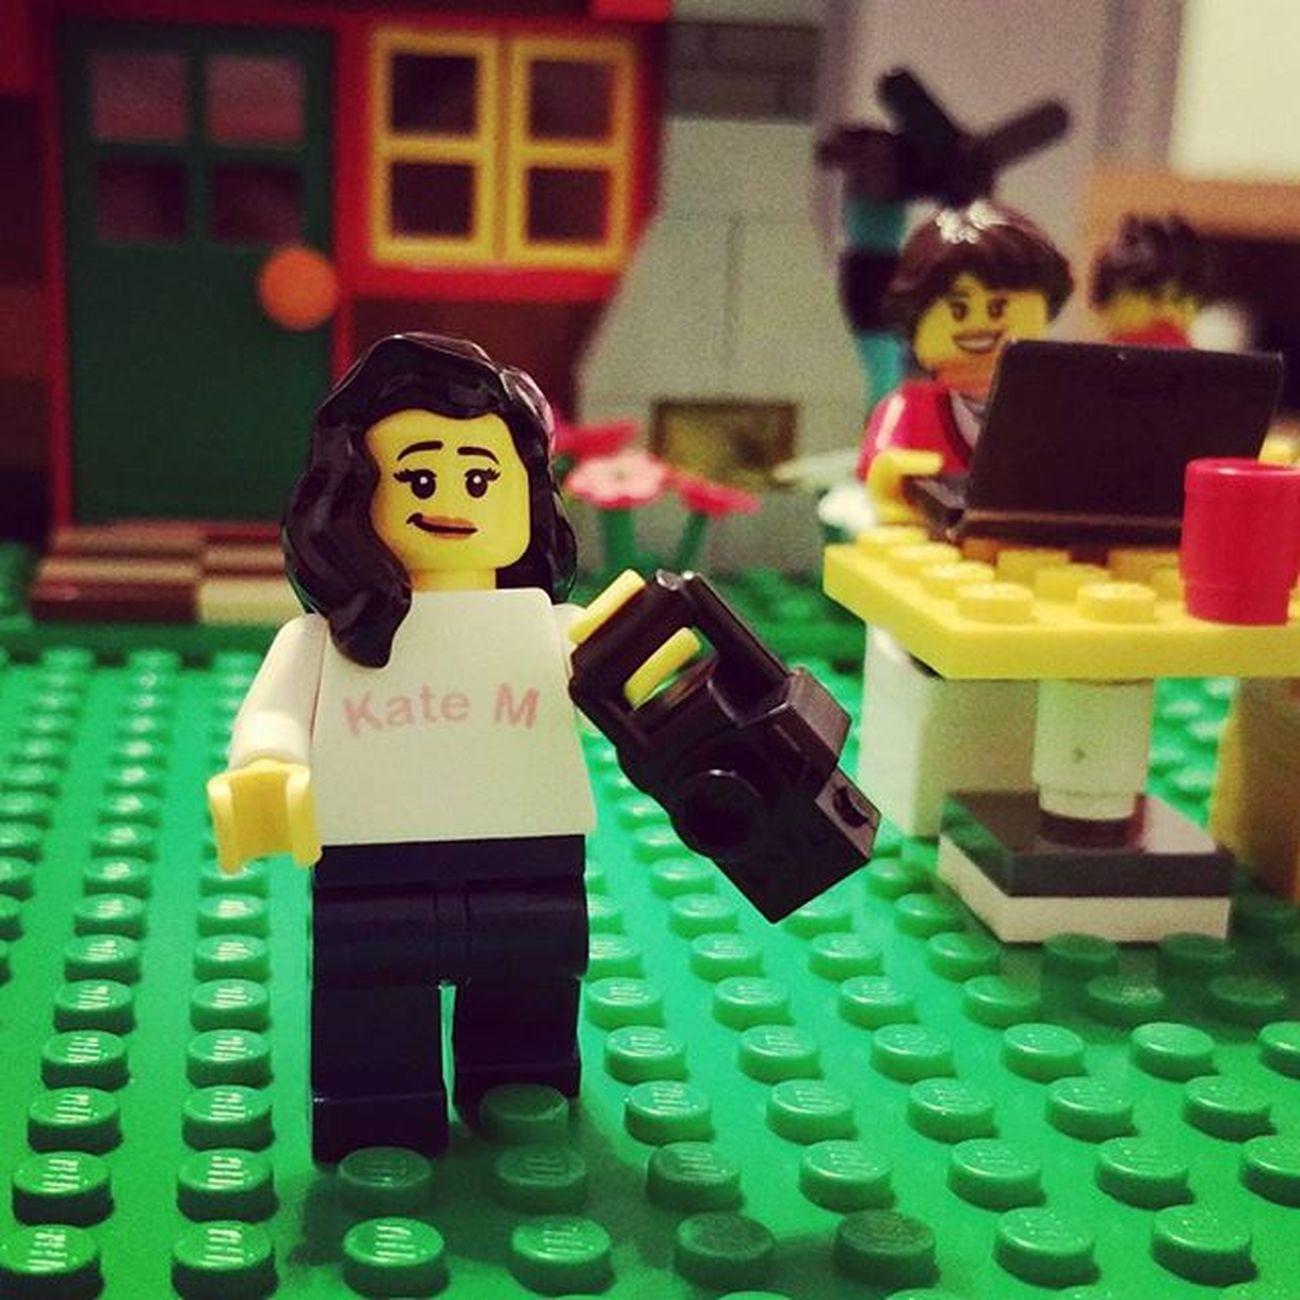 Legolove LegoLover Legoigers Afol Katemarie_uk Moc Legoinstagram Legoig Shotonandroid Shotonsamsung Legominifigures Legominifigs Minifig Minifigures Minifigure